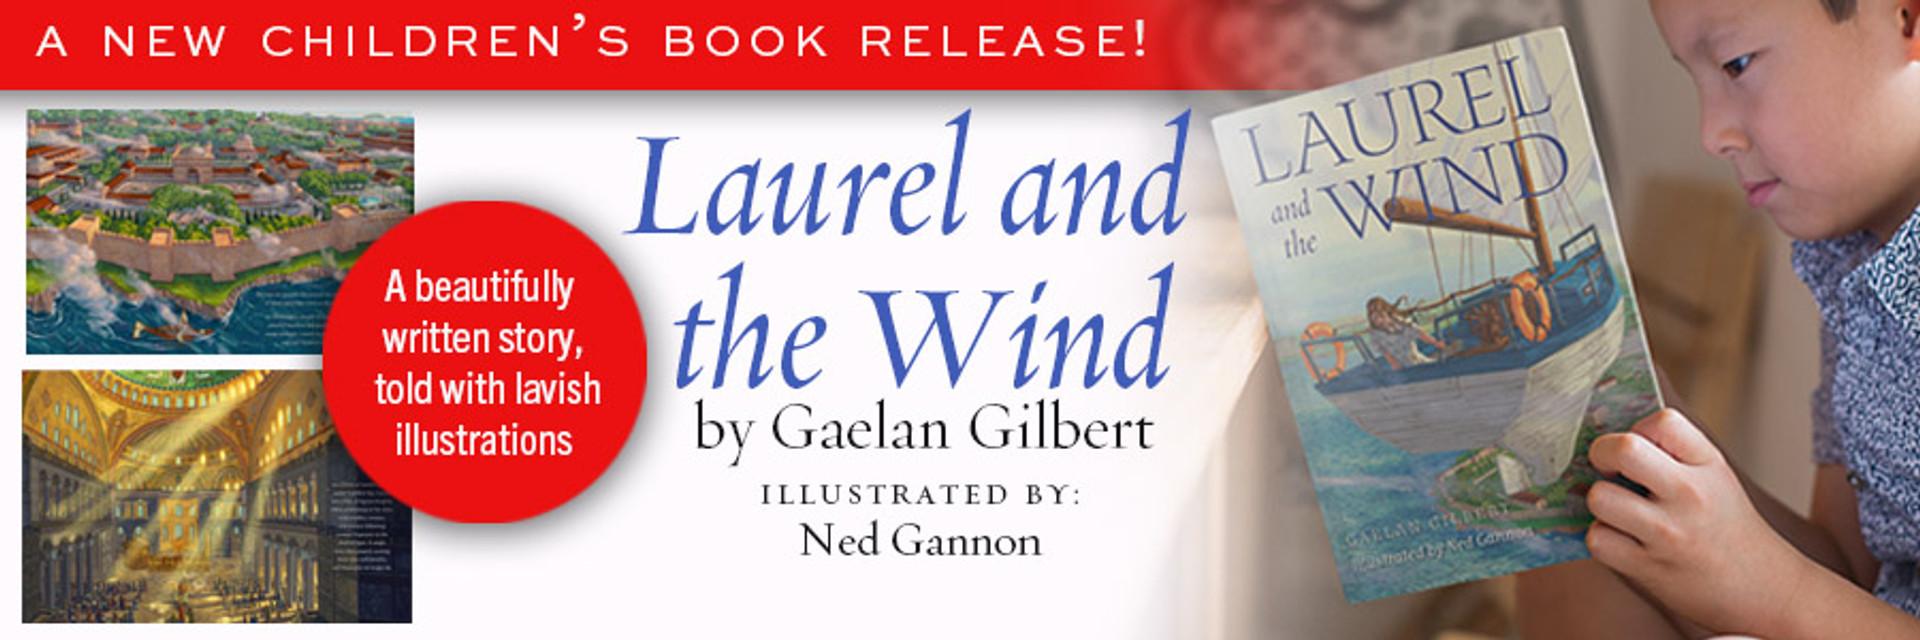 Laurel and the Wind children's book